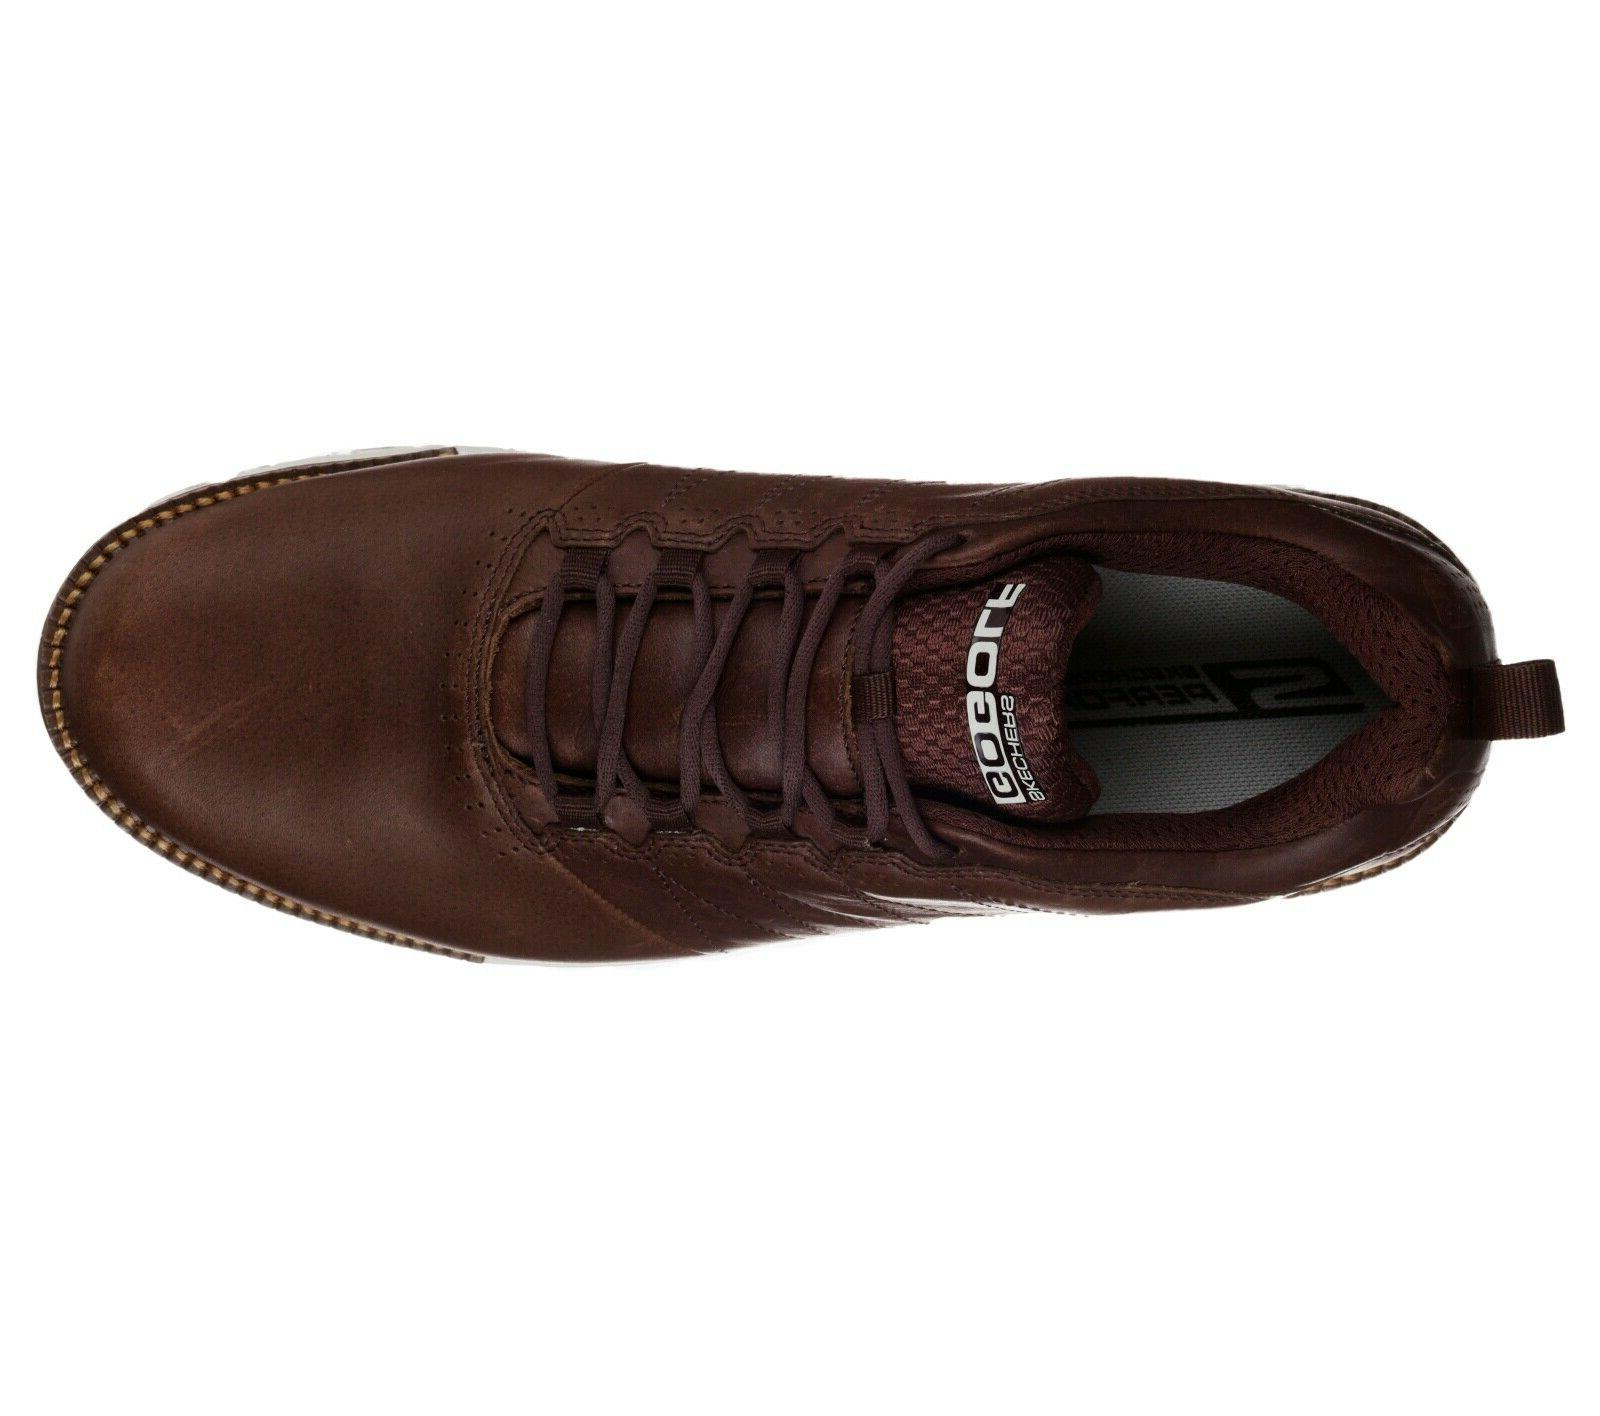 Skechers V.3 CHOC Shoes-Style